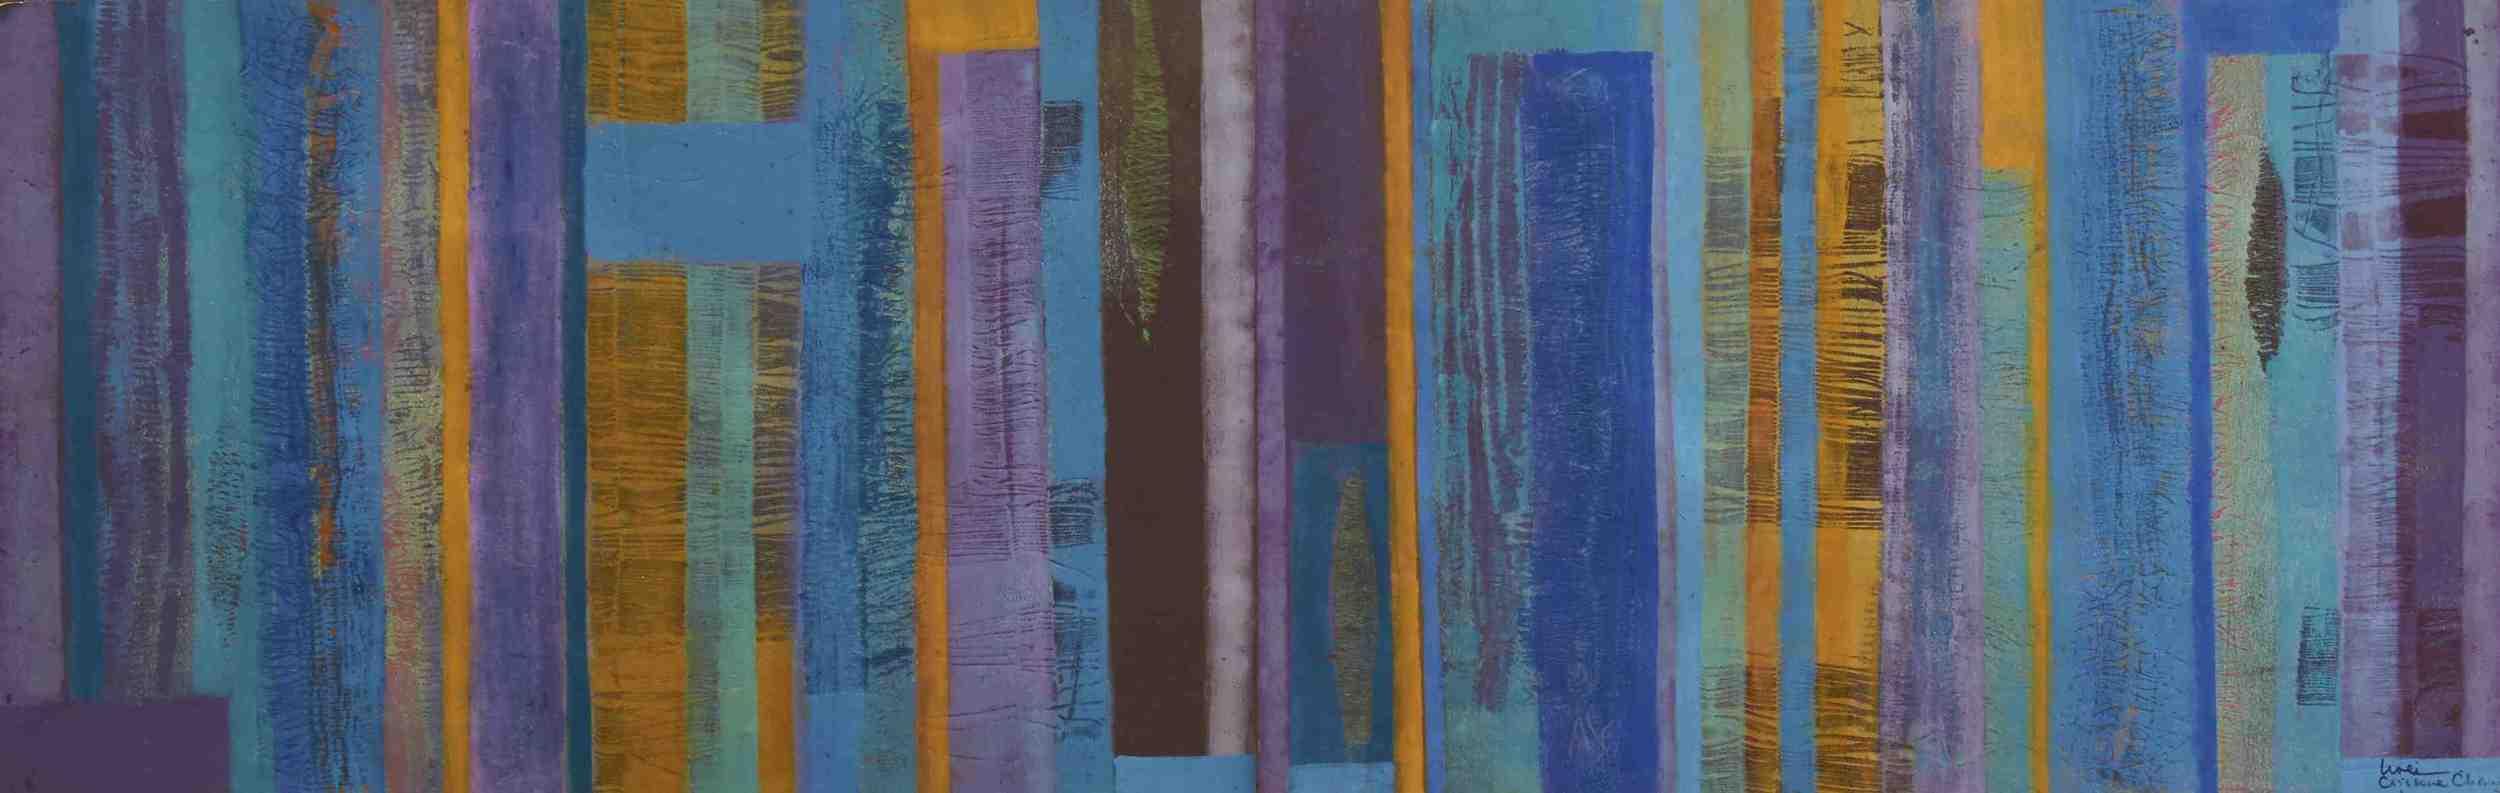 Weaving series: Weaving the Sky & Sea